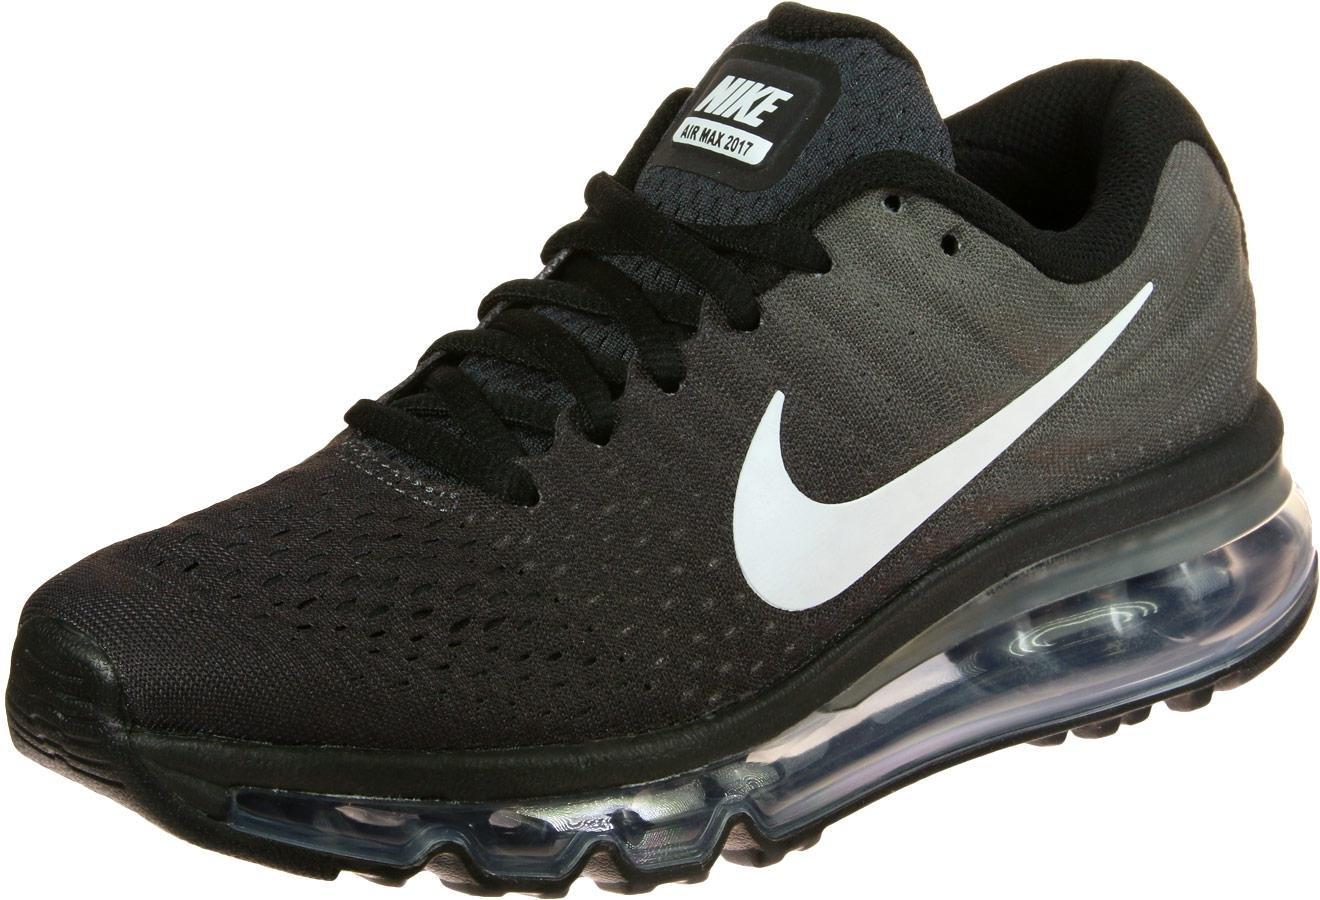 892508951eb4f Nike Air Max 2017 Sneaker (schwarz/silber/weiß) im Preisvergleich